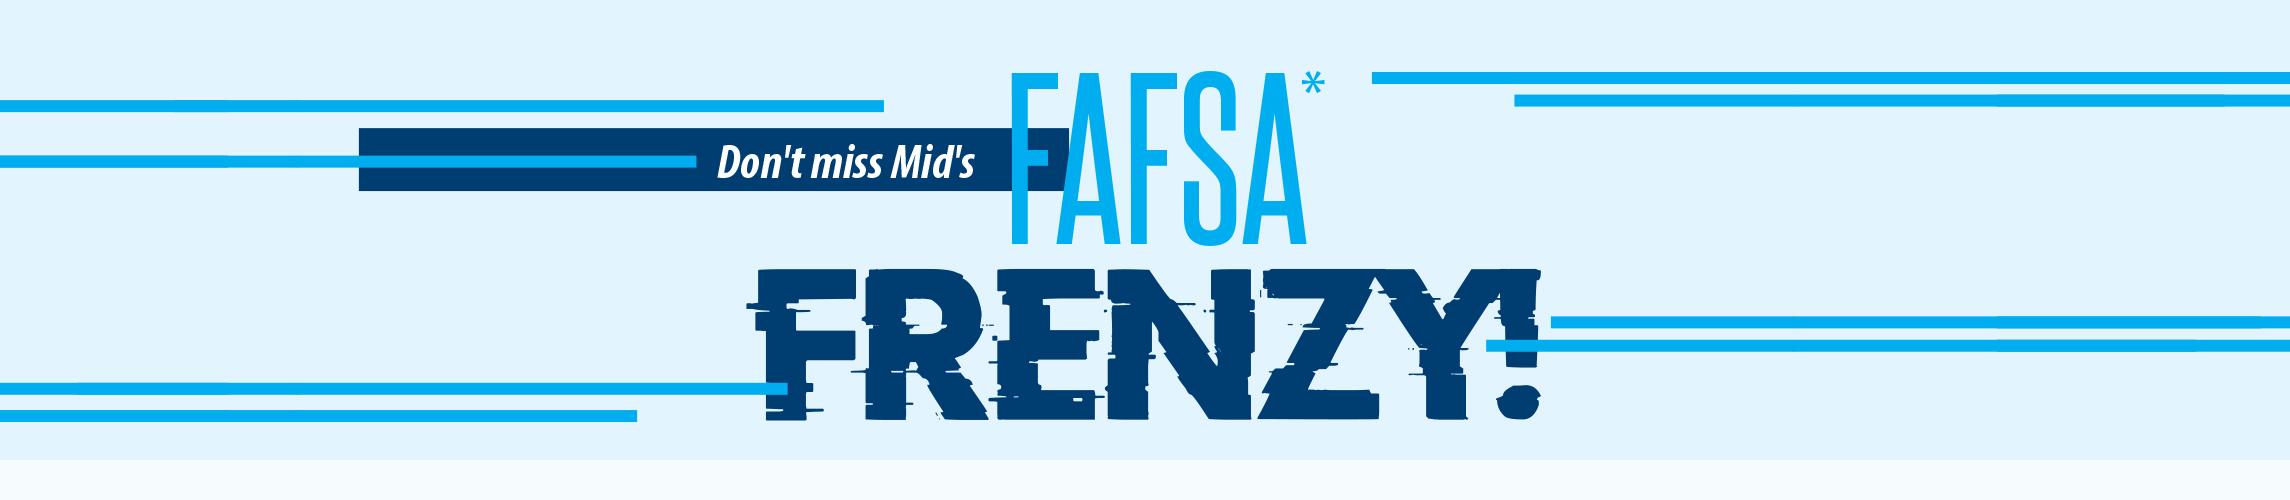 FAFSA FRENZY landing page